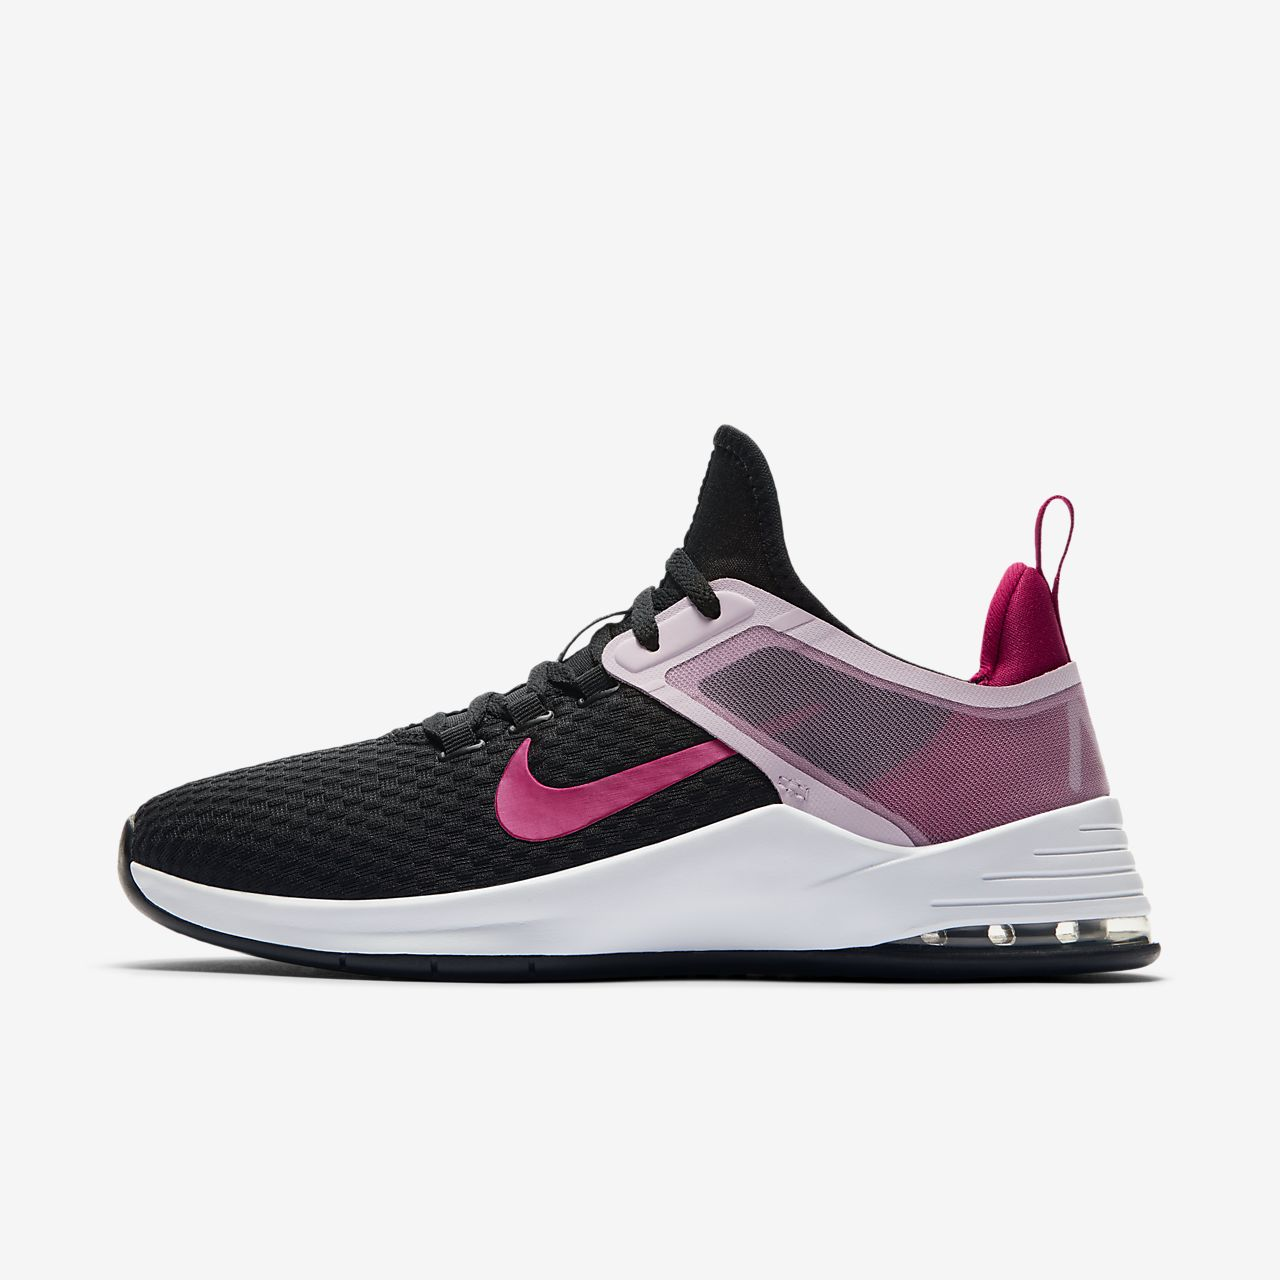 nike air max 90 essential billig, Nike free tr udsalg